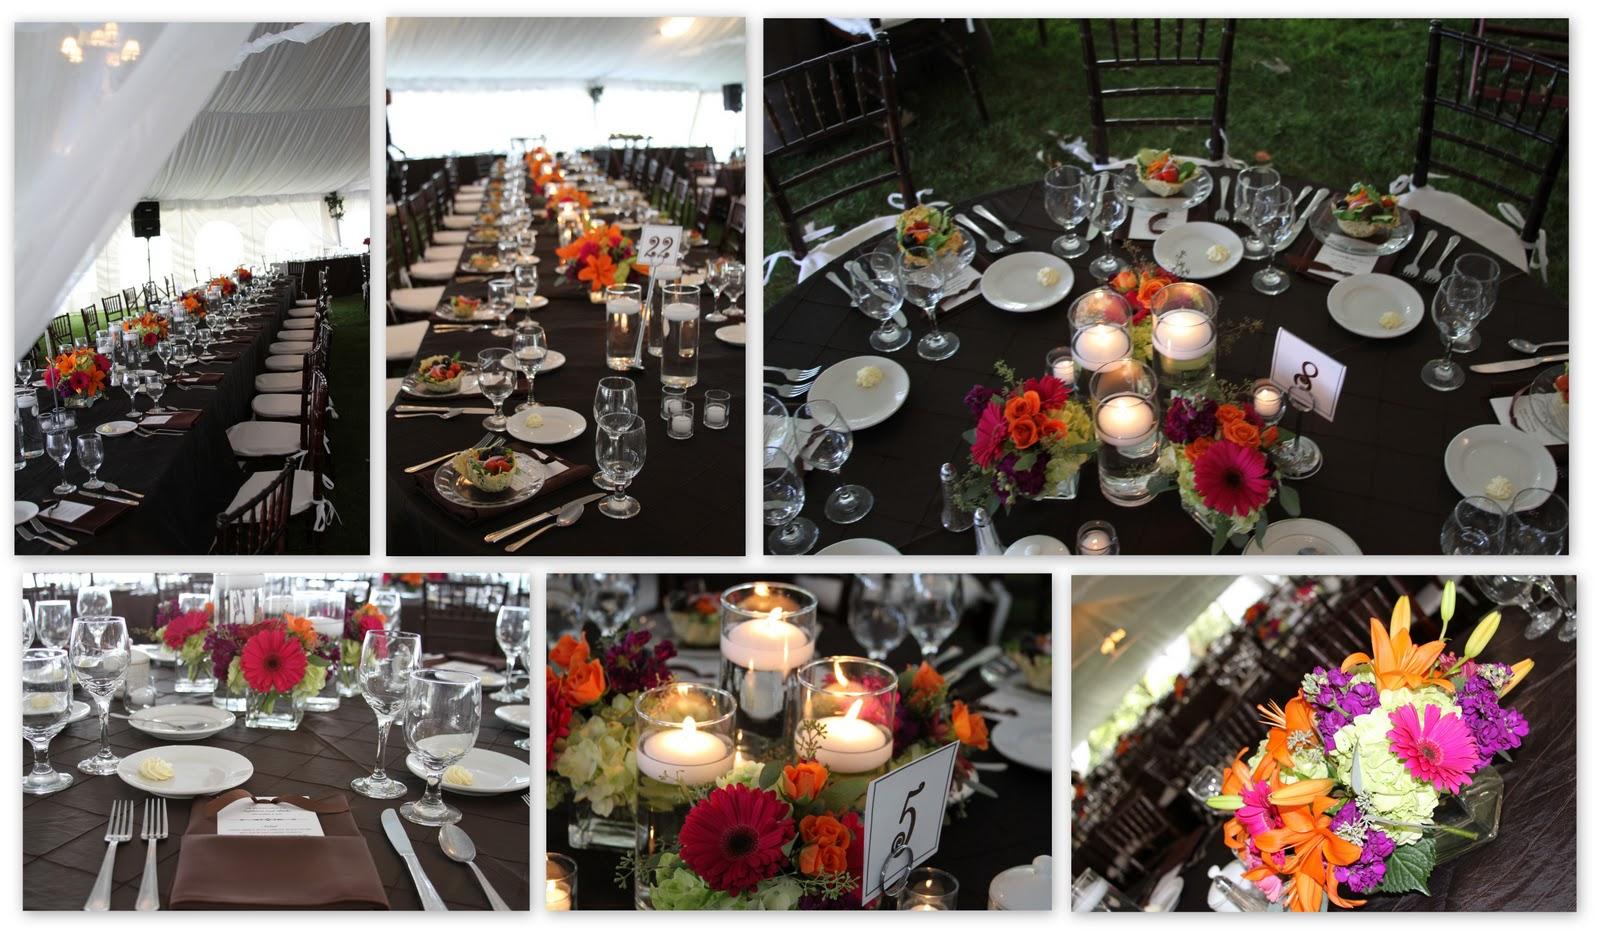 chair cover rental toledo ohio custom dining slipcovers crowning celebrations september 2010